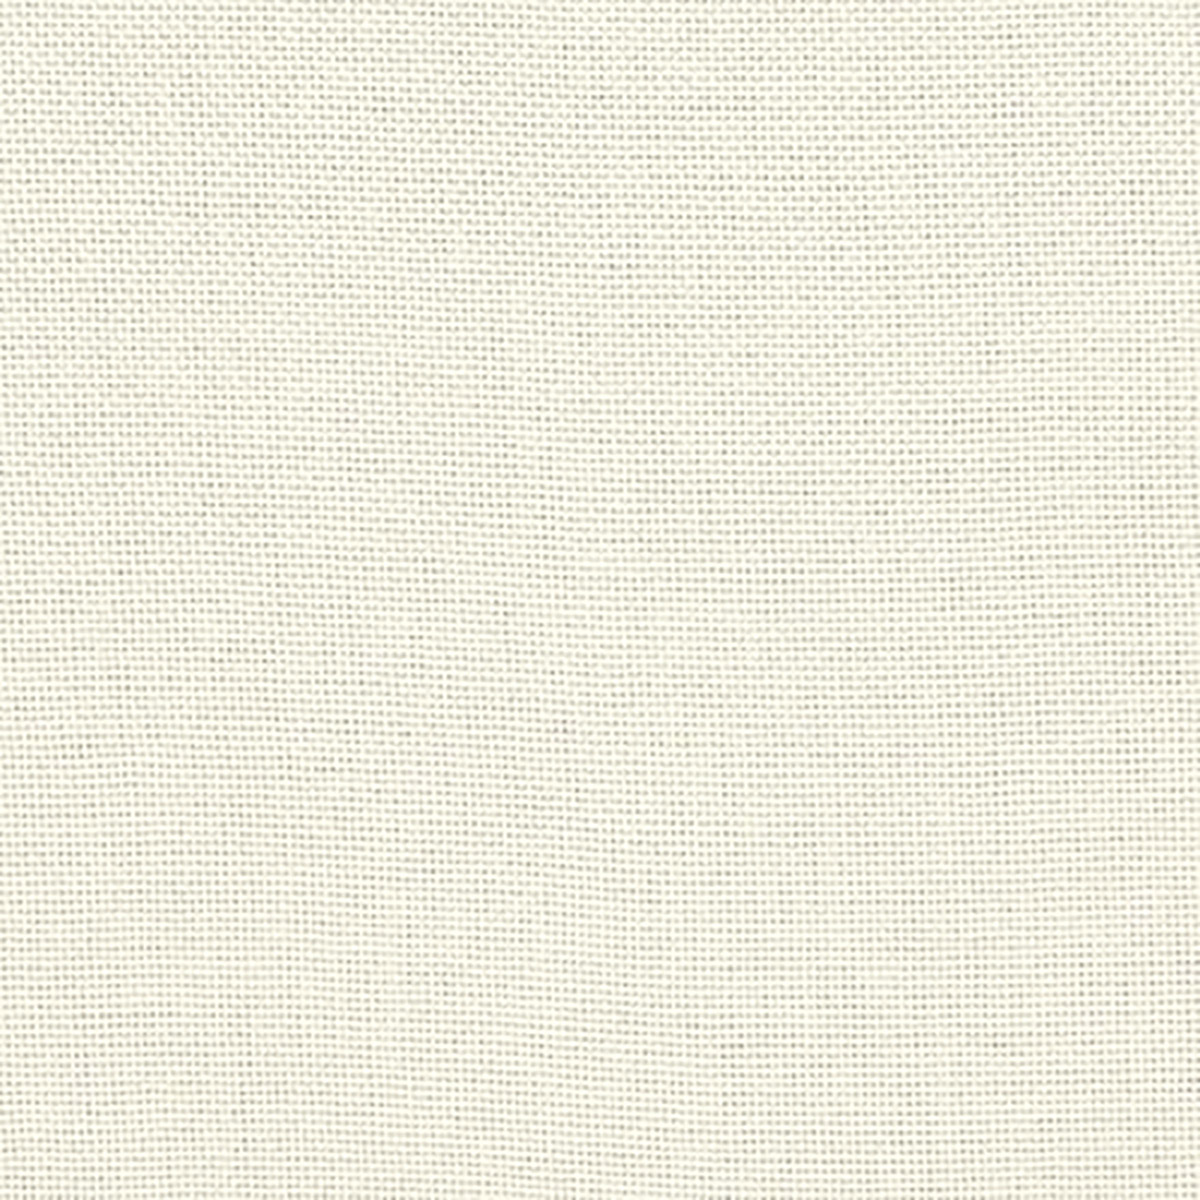 ivory linen fabric